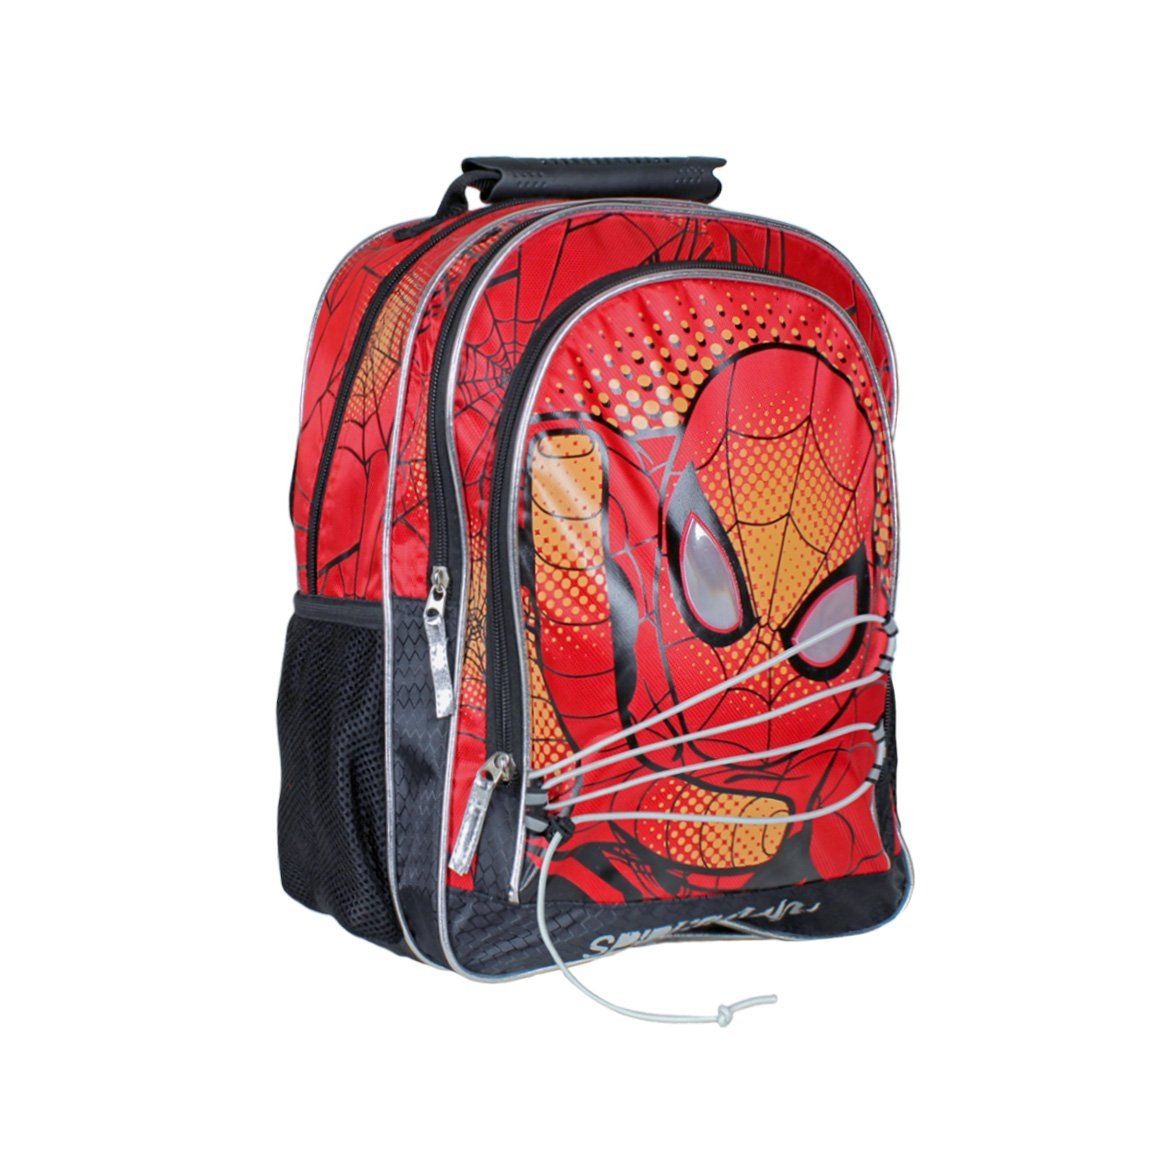 Spiderman Mochila, 36 cm, Color Rojo